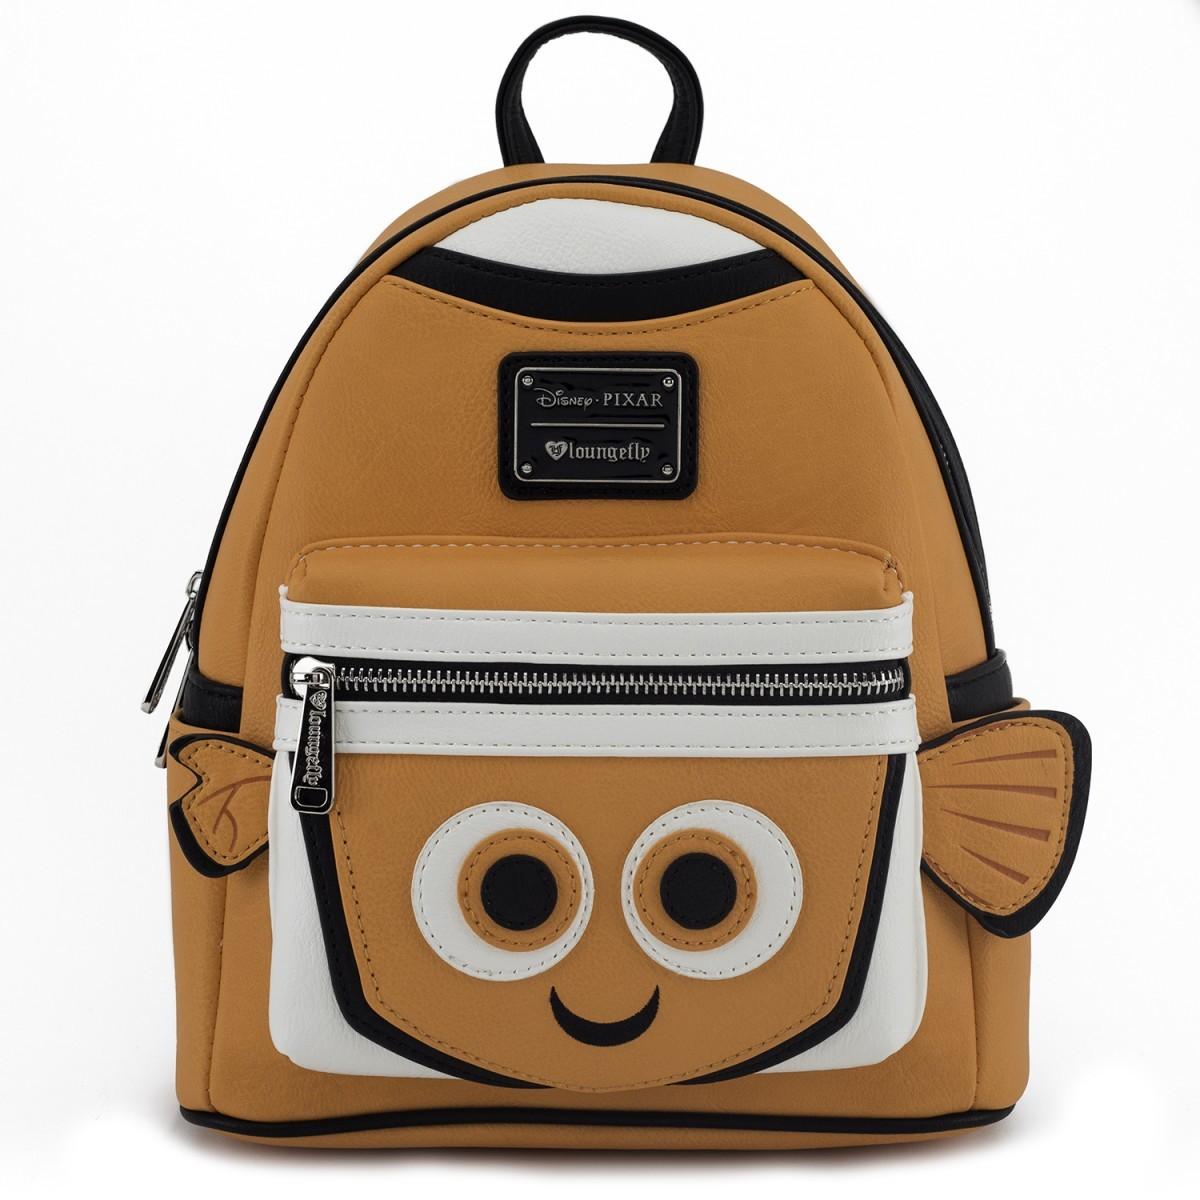 Disney Finding Nemo Mini Backpack image